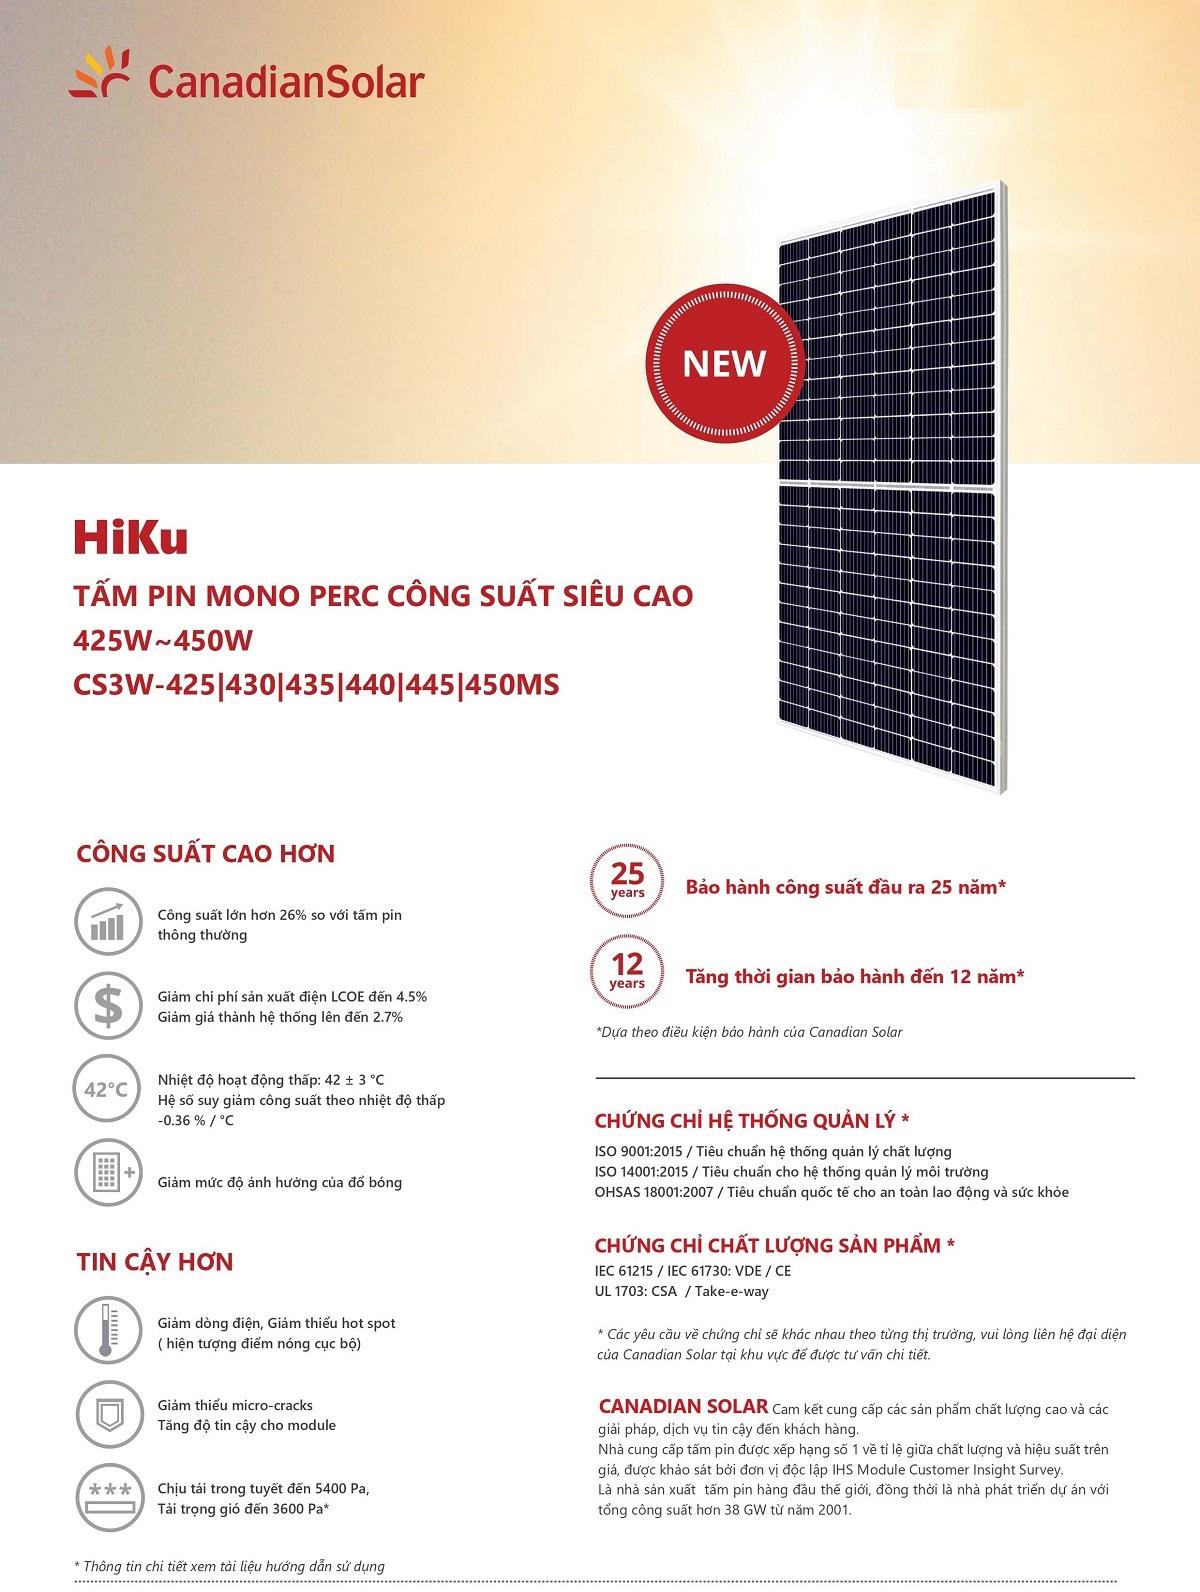 catalogue-tam-pin-solar-canadian-445w-3f4cae68-13b8-49ba-9fa6-cb37a25c099e